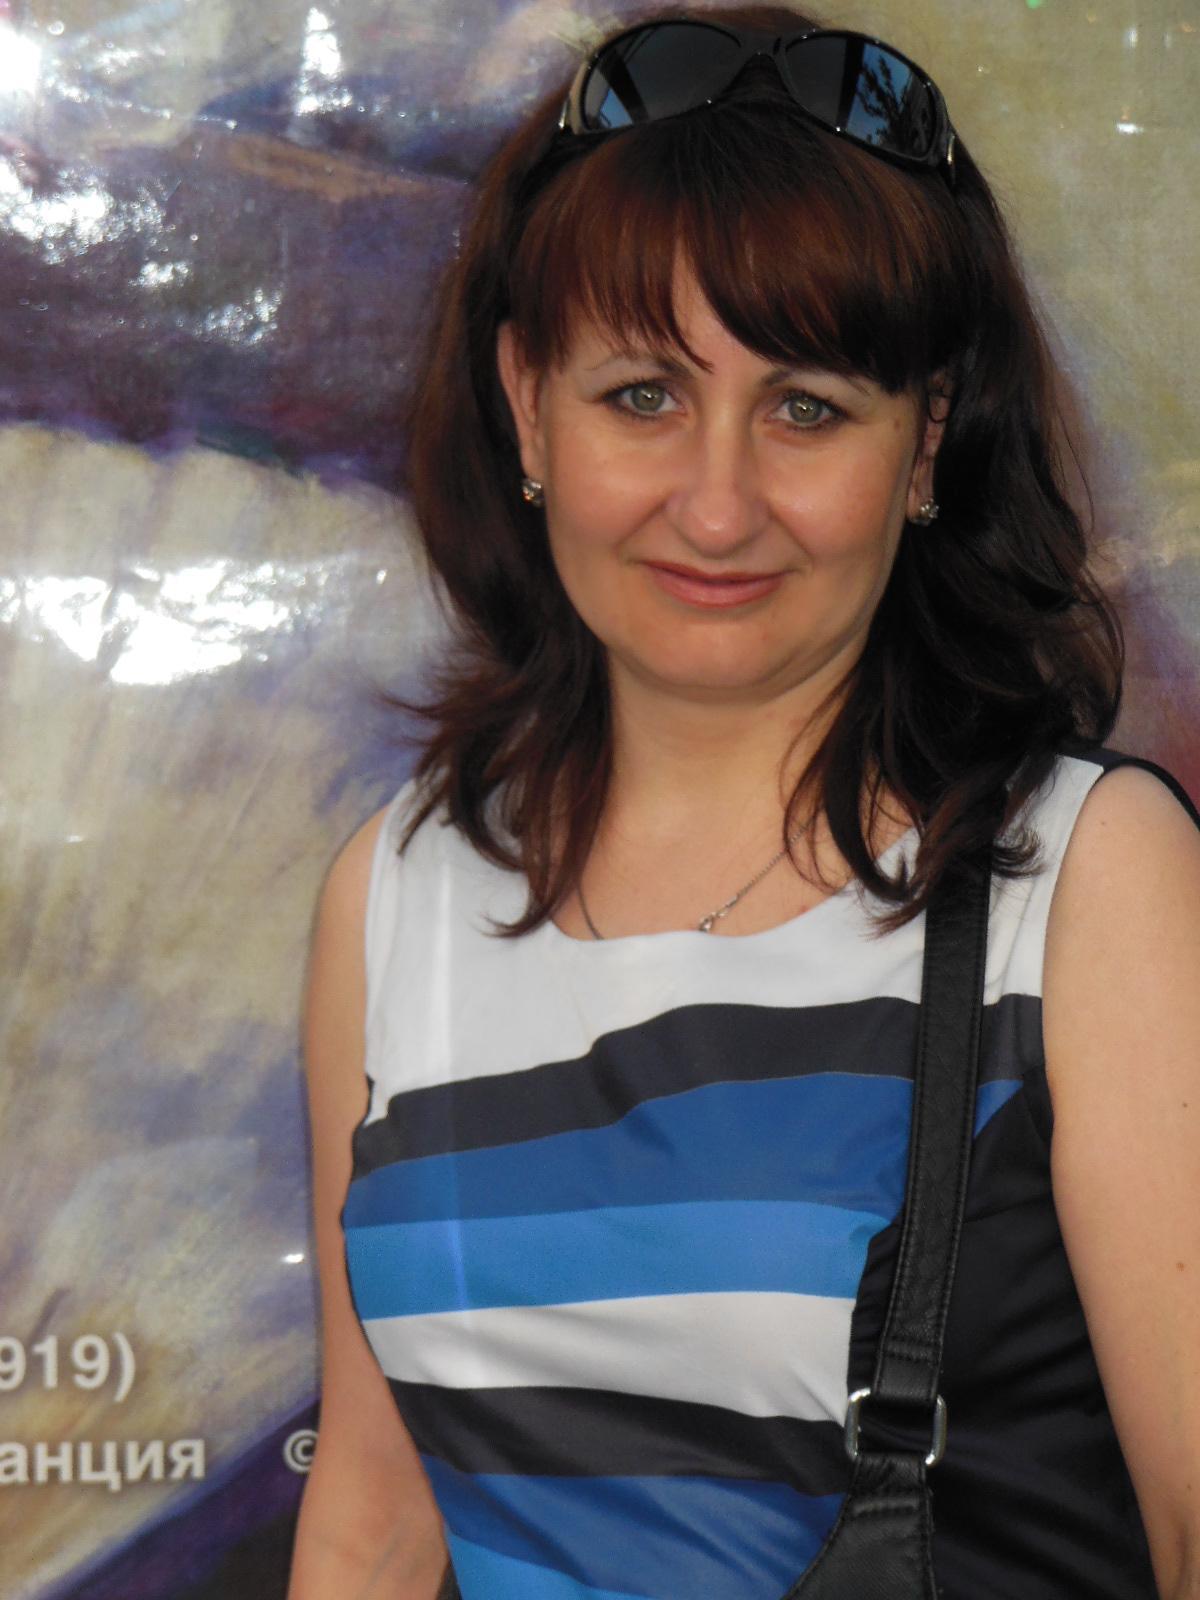 user318, Ольга, 40, Омск